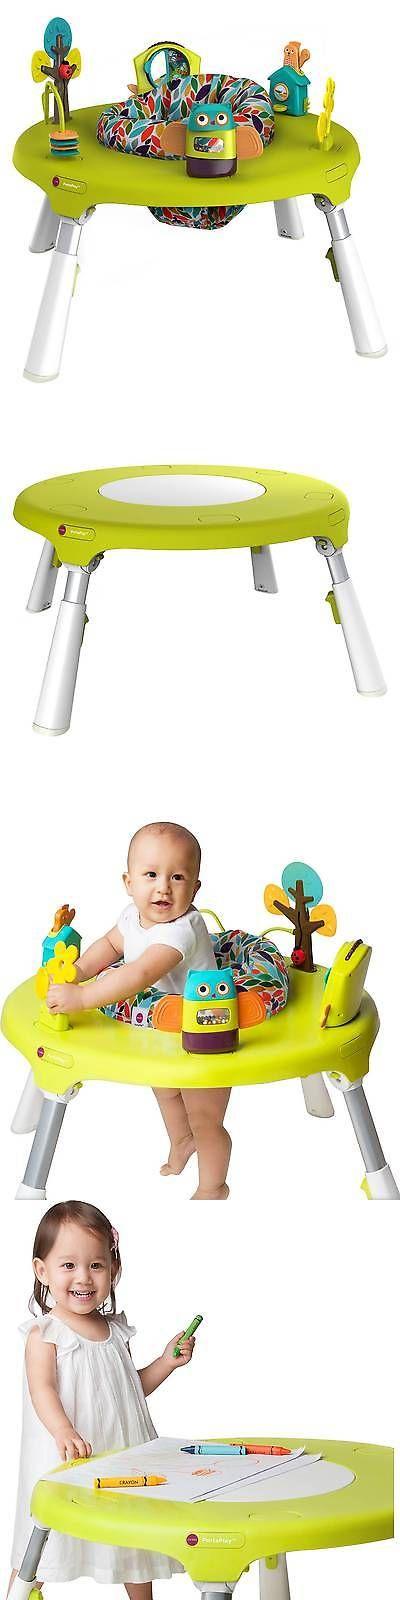 690fd70db shop best sellers bda6a 1ba39 baby entertainment center toddler ...